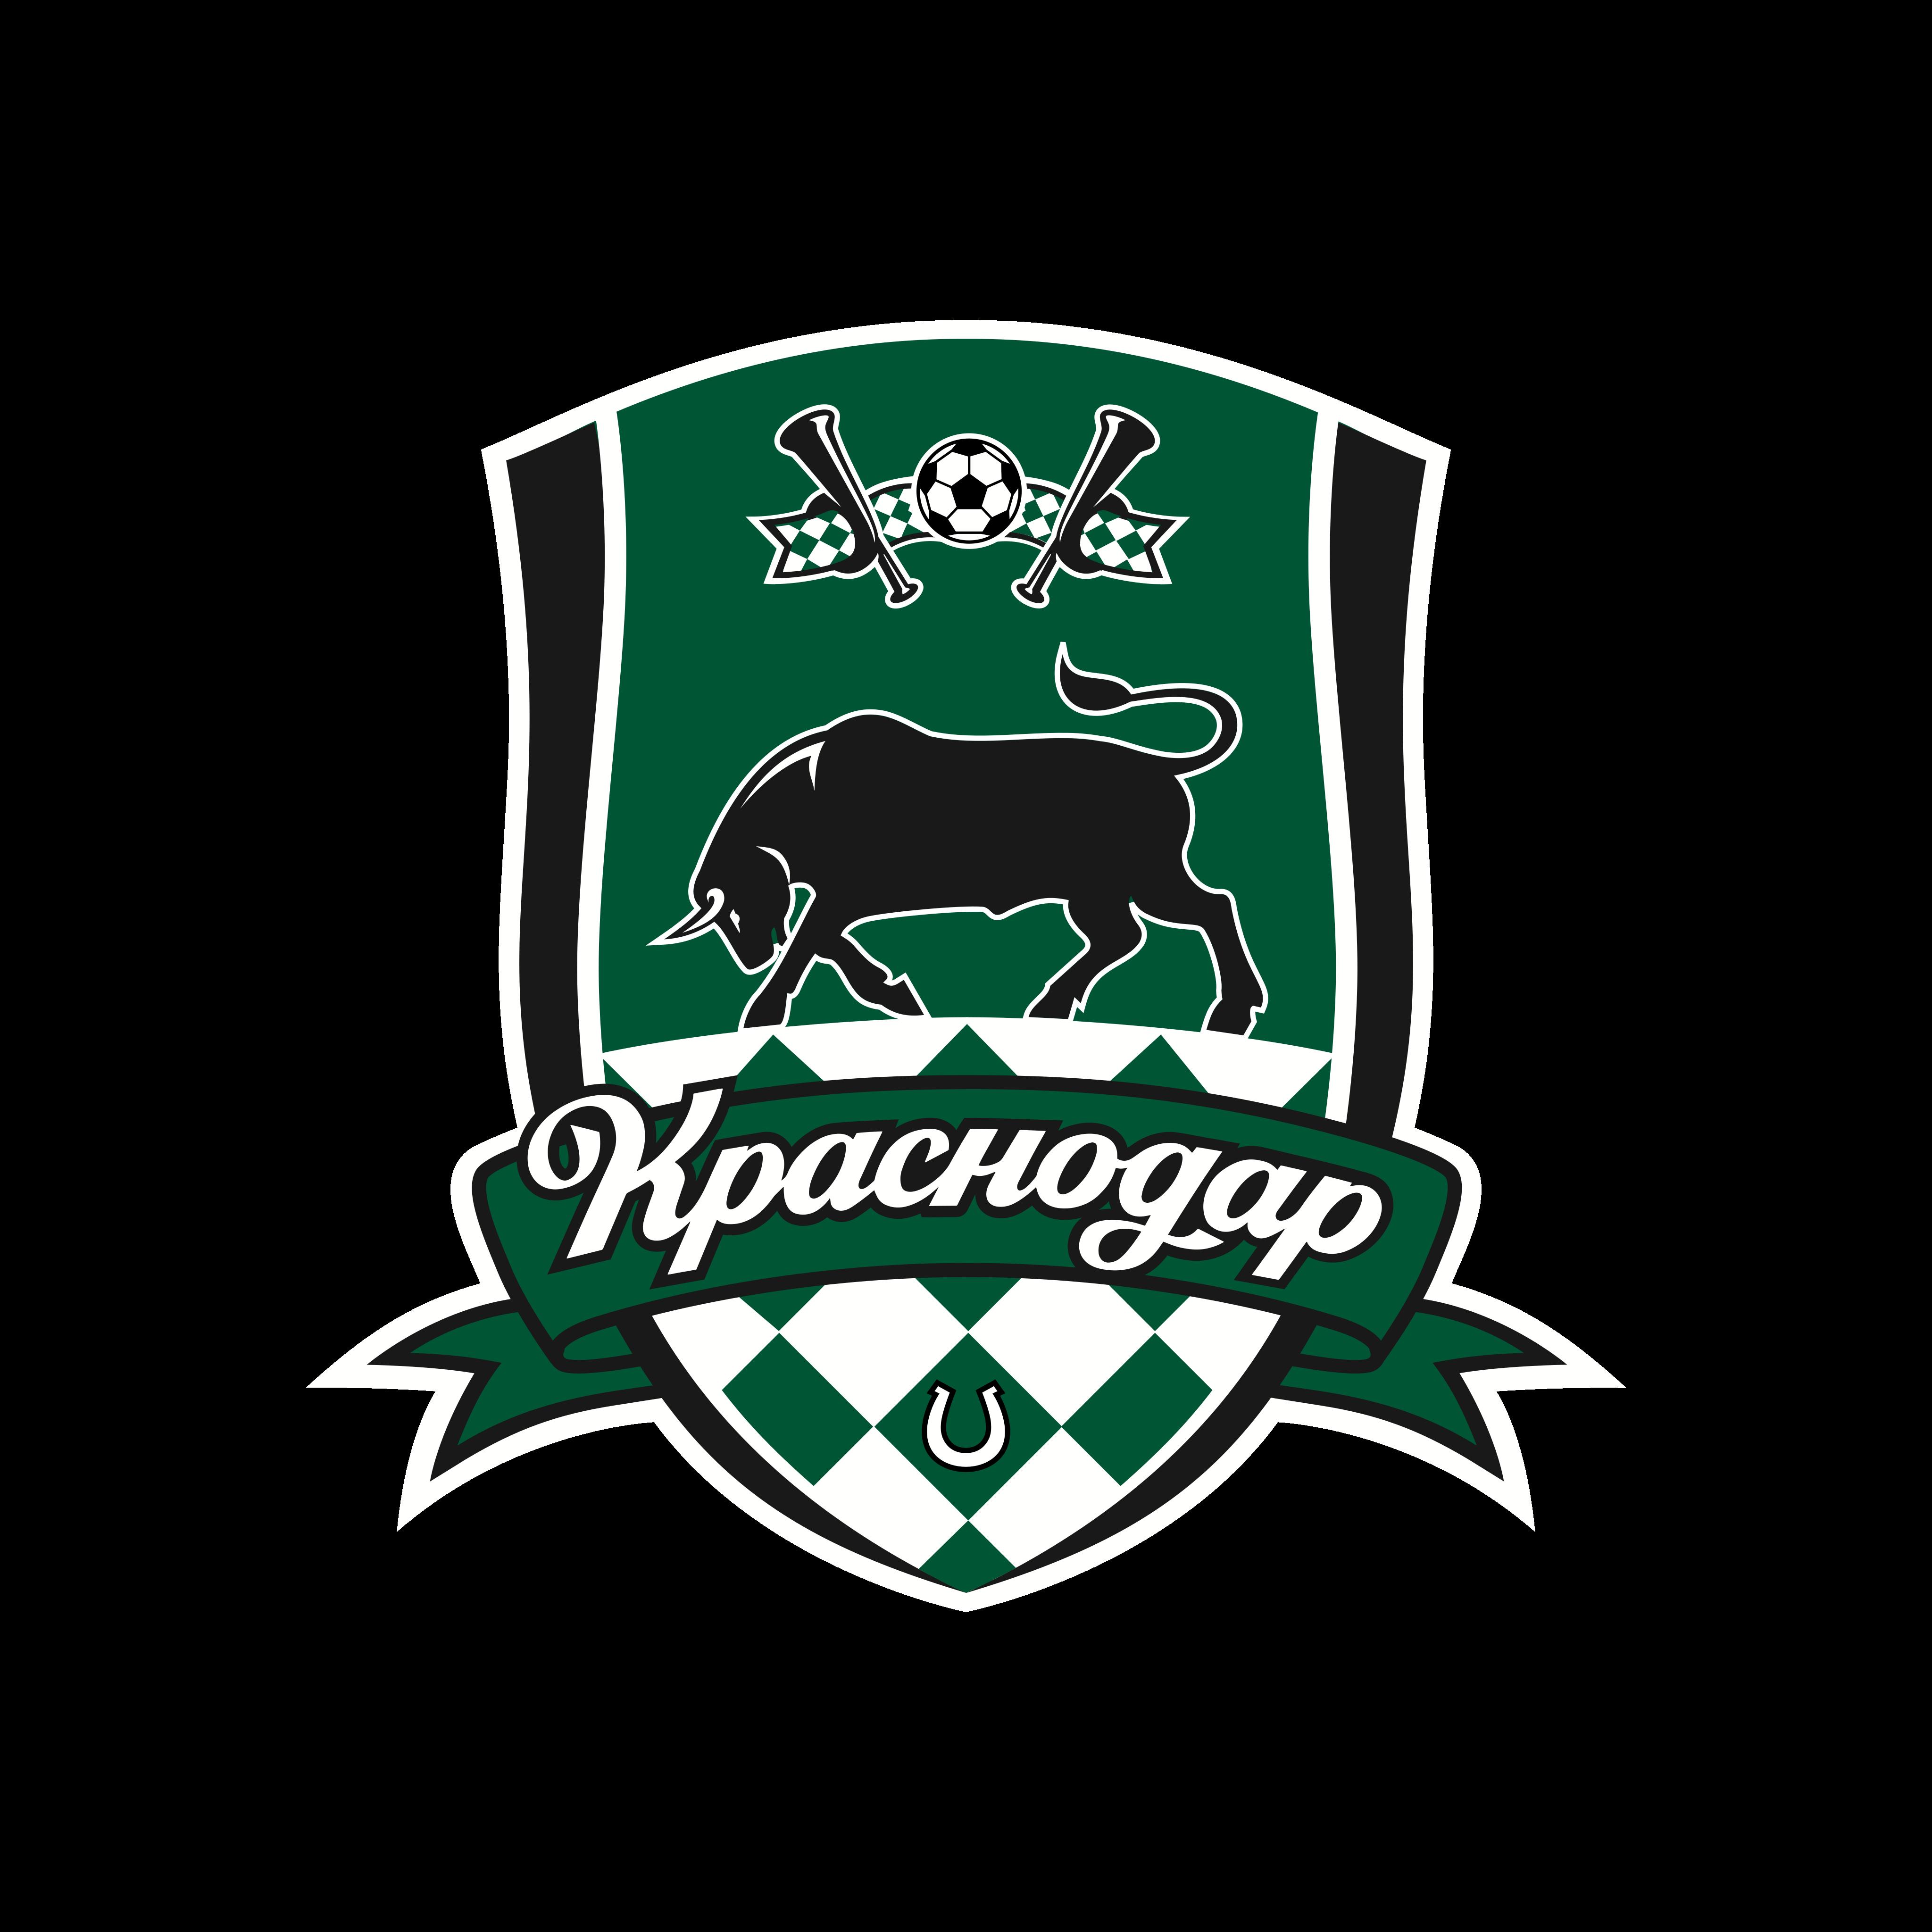 fc krasnodar logo 0 - FC Krasnodar Logo